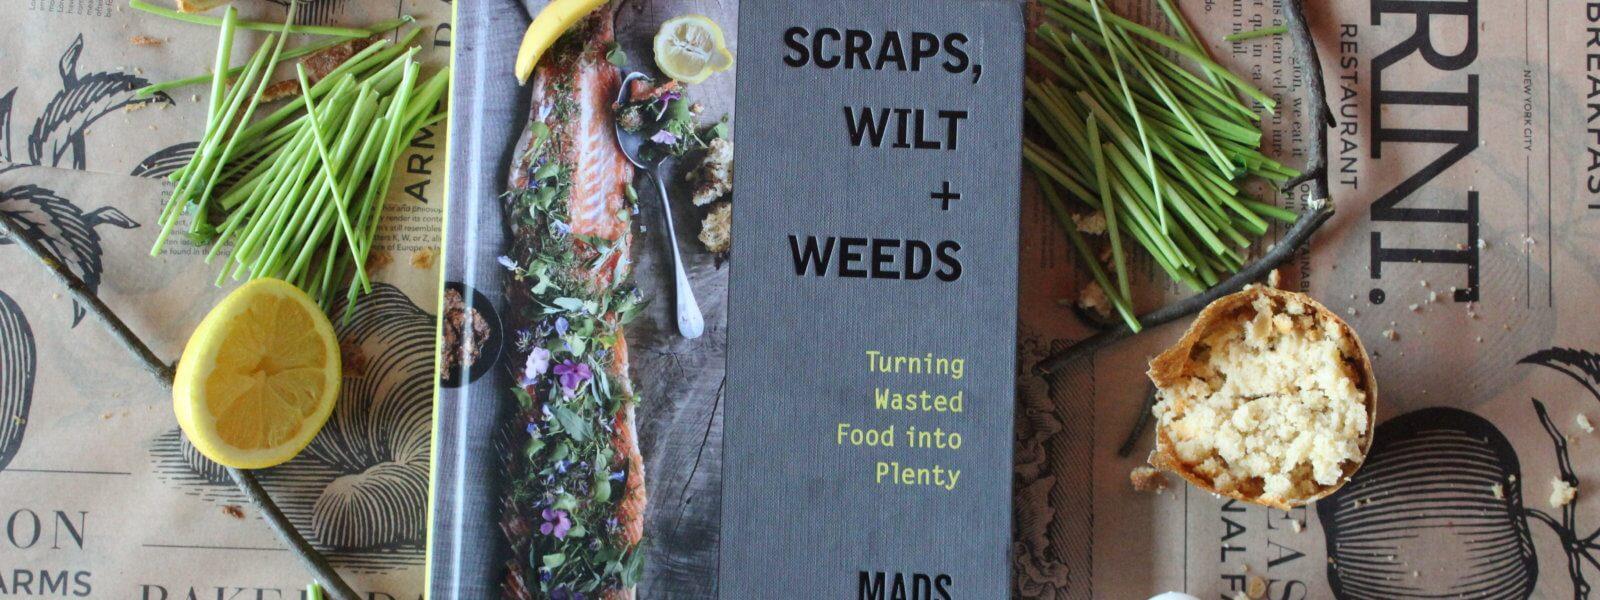 "Book entitled ""Scraps, Wilt & Weeds."""